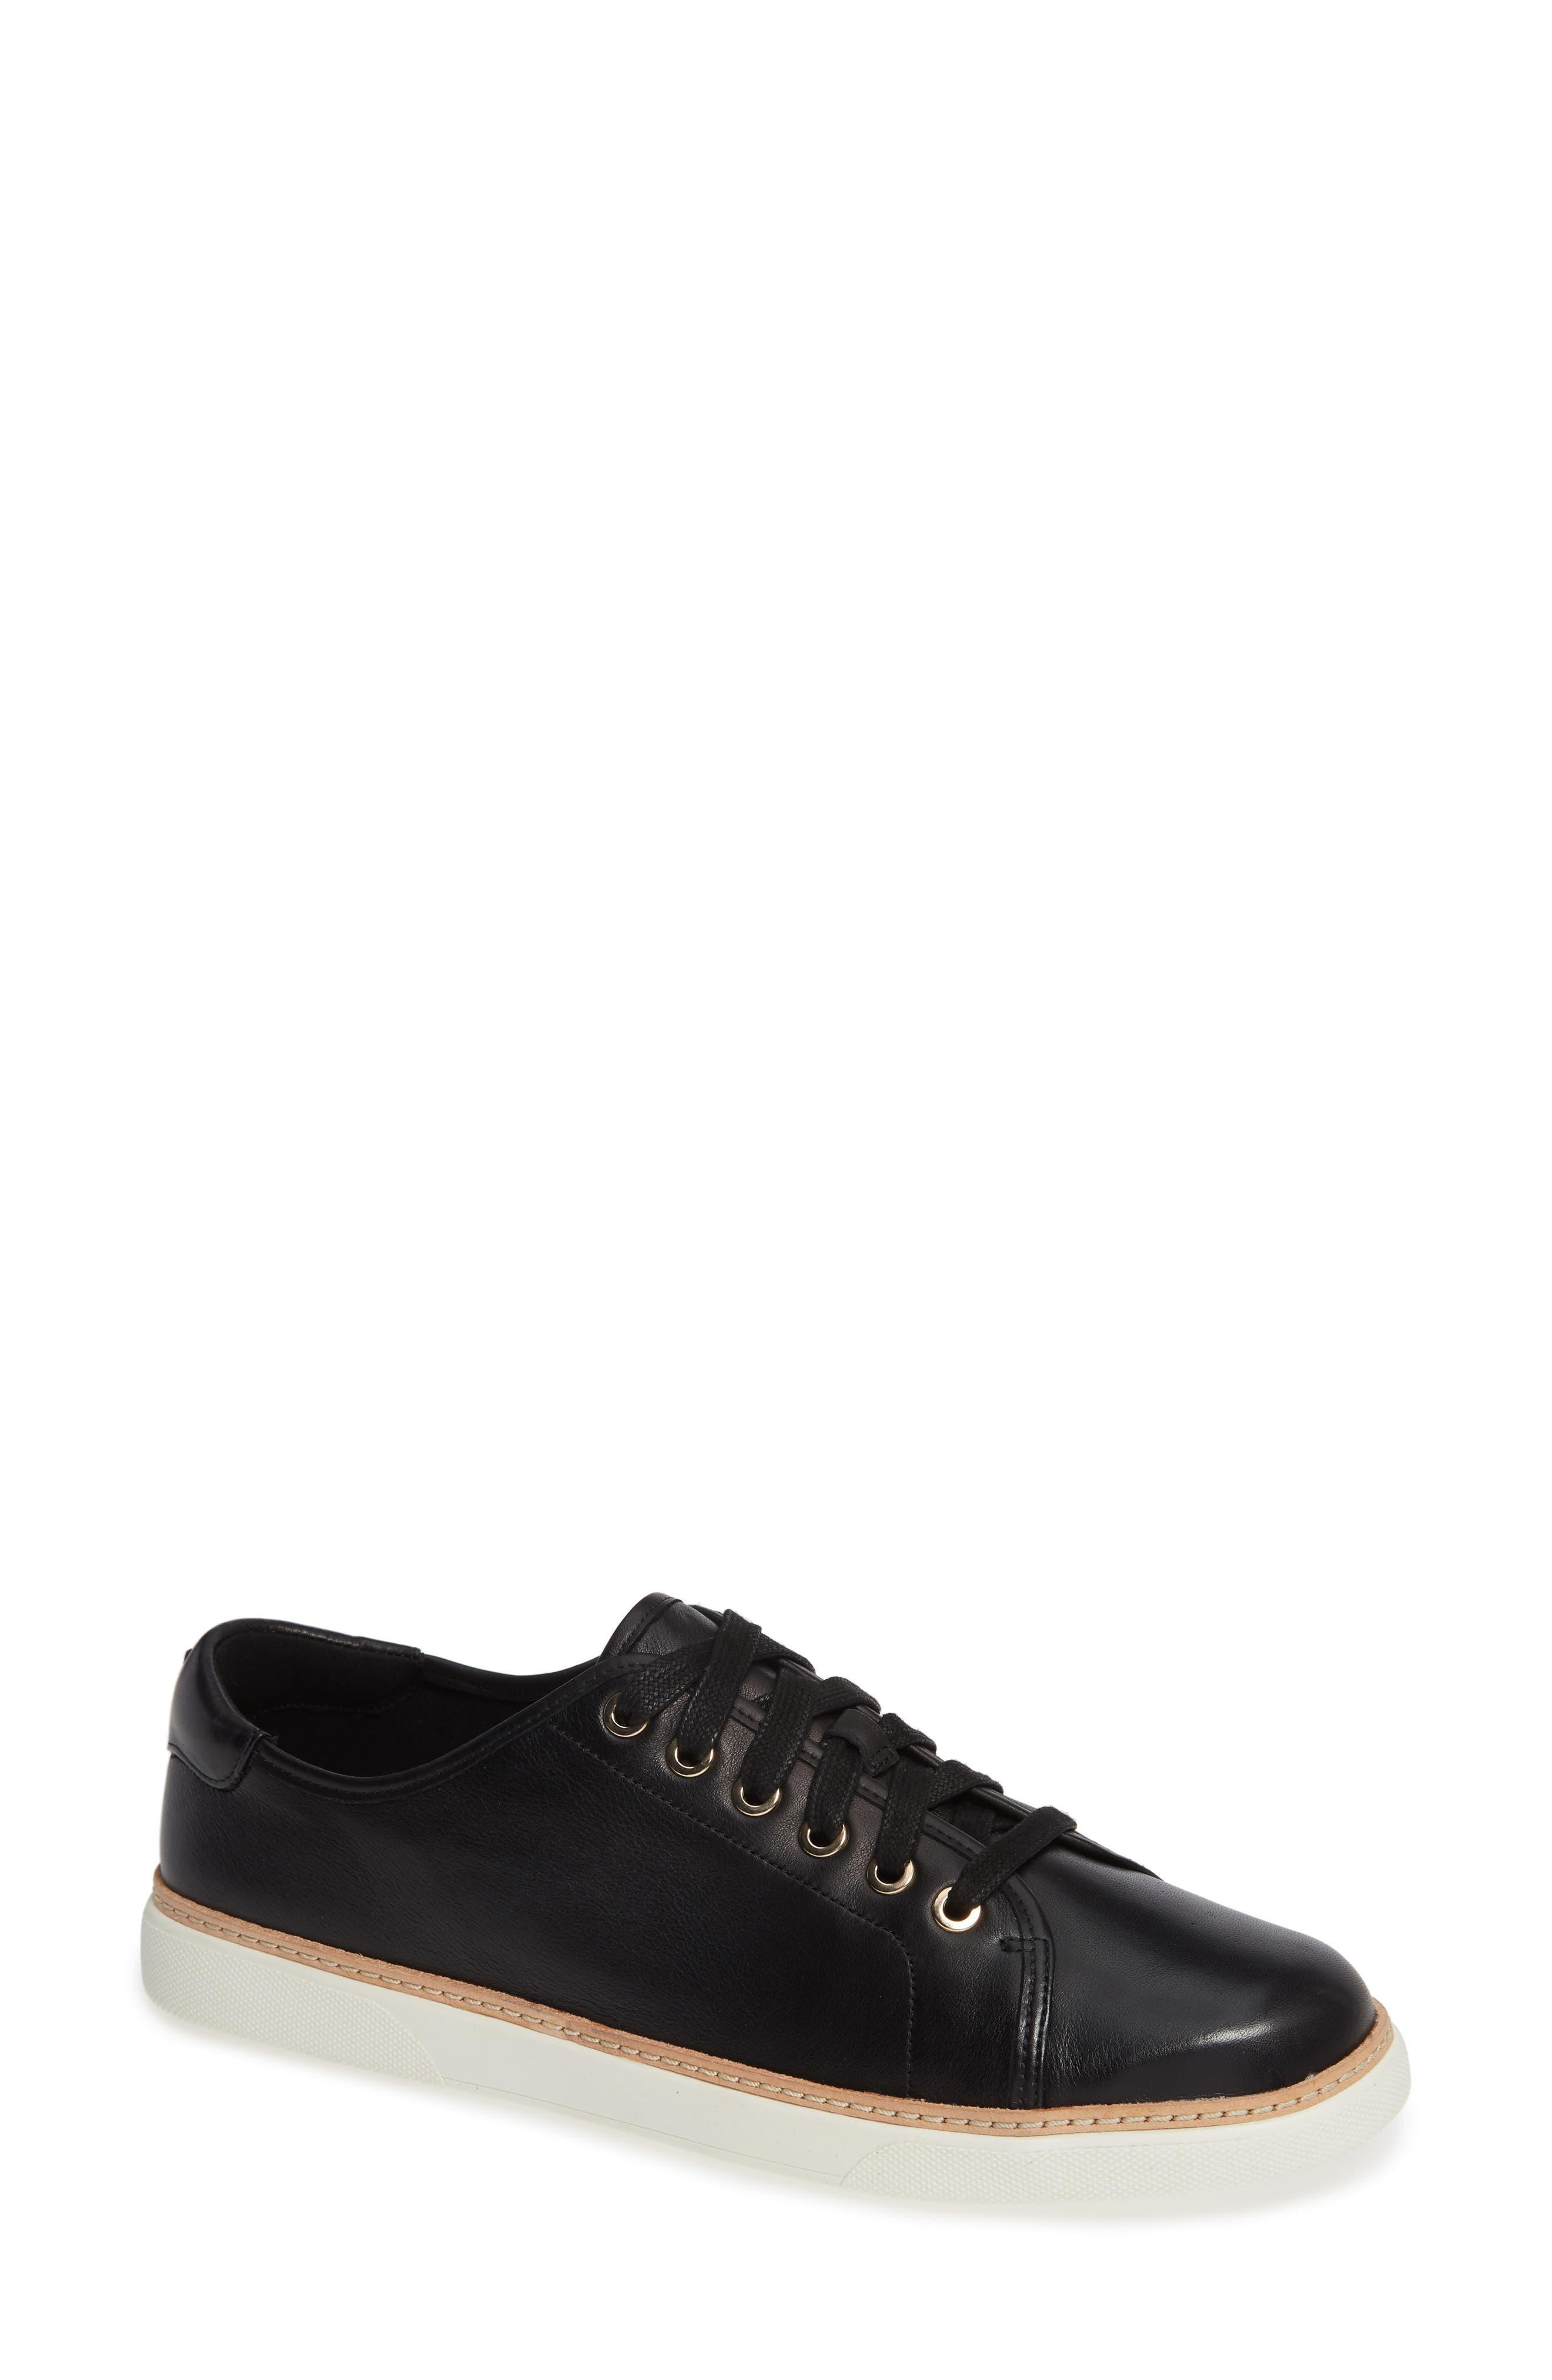 Leah Sneaker,                         Main,                         color, BLACK LEATHER